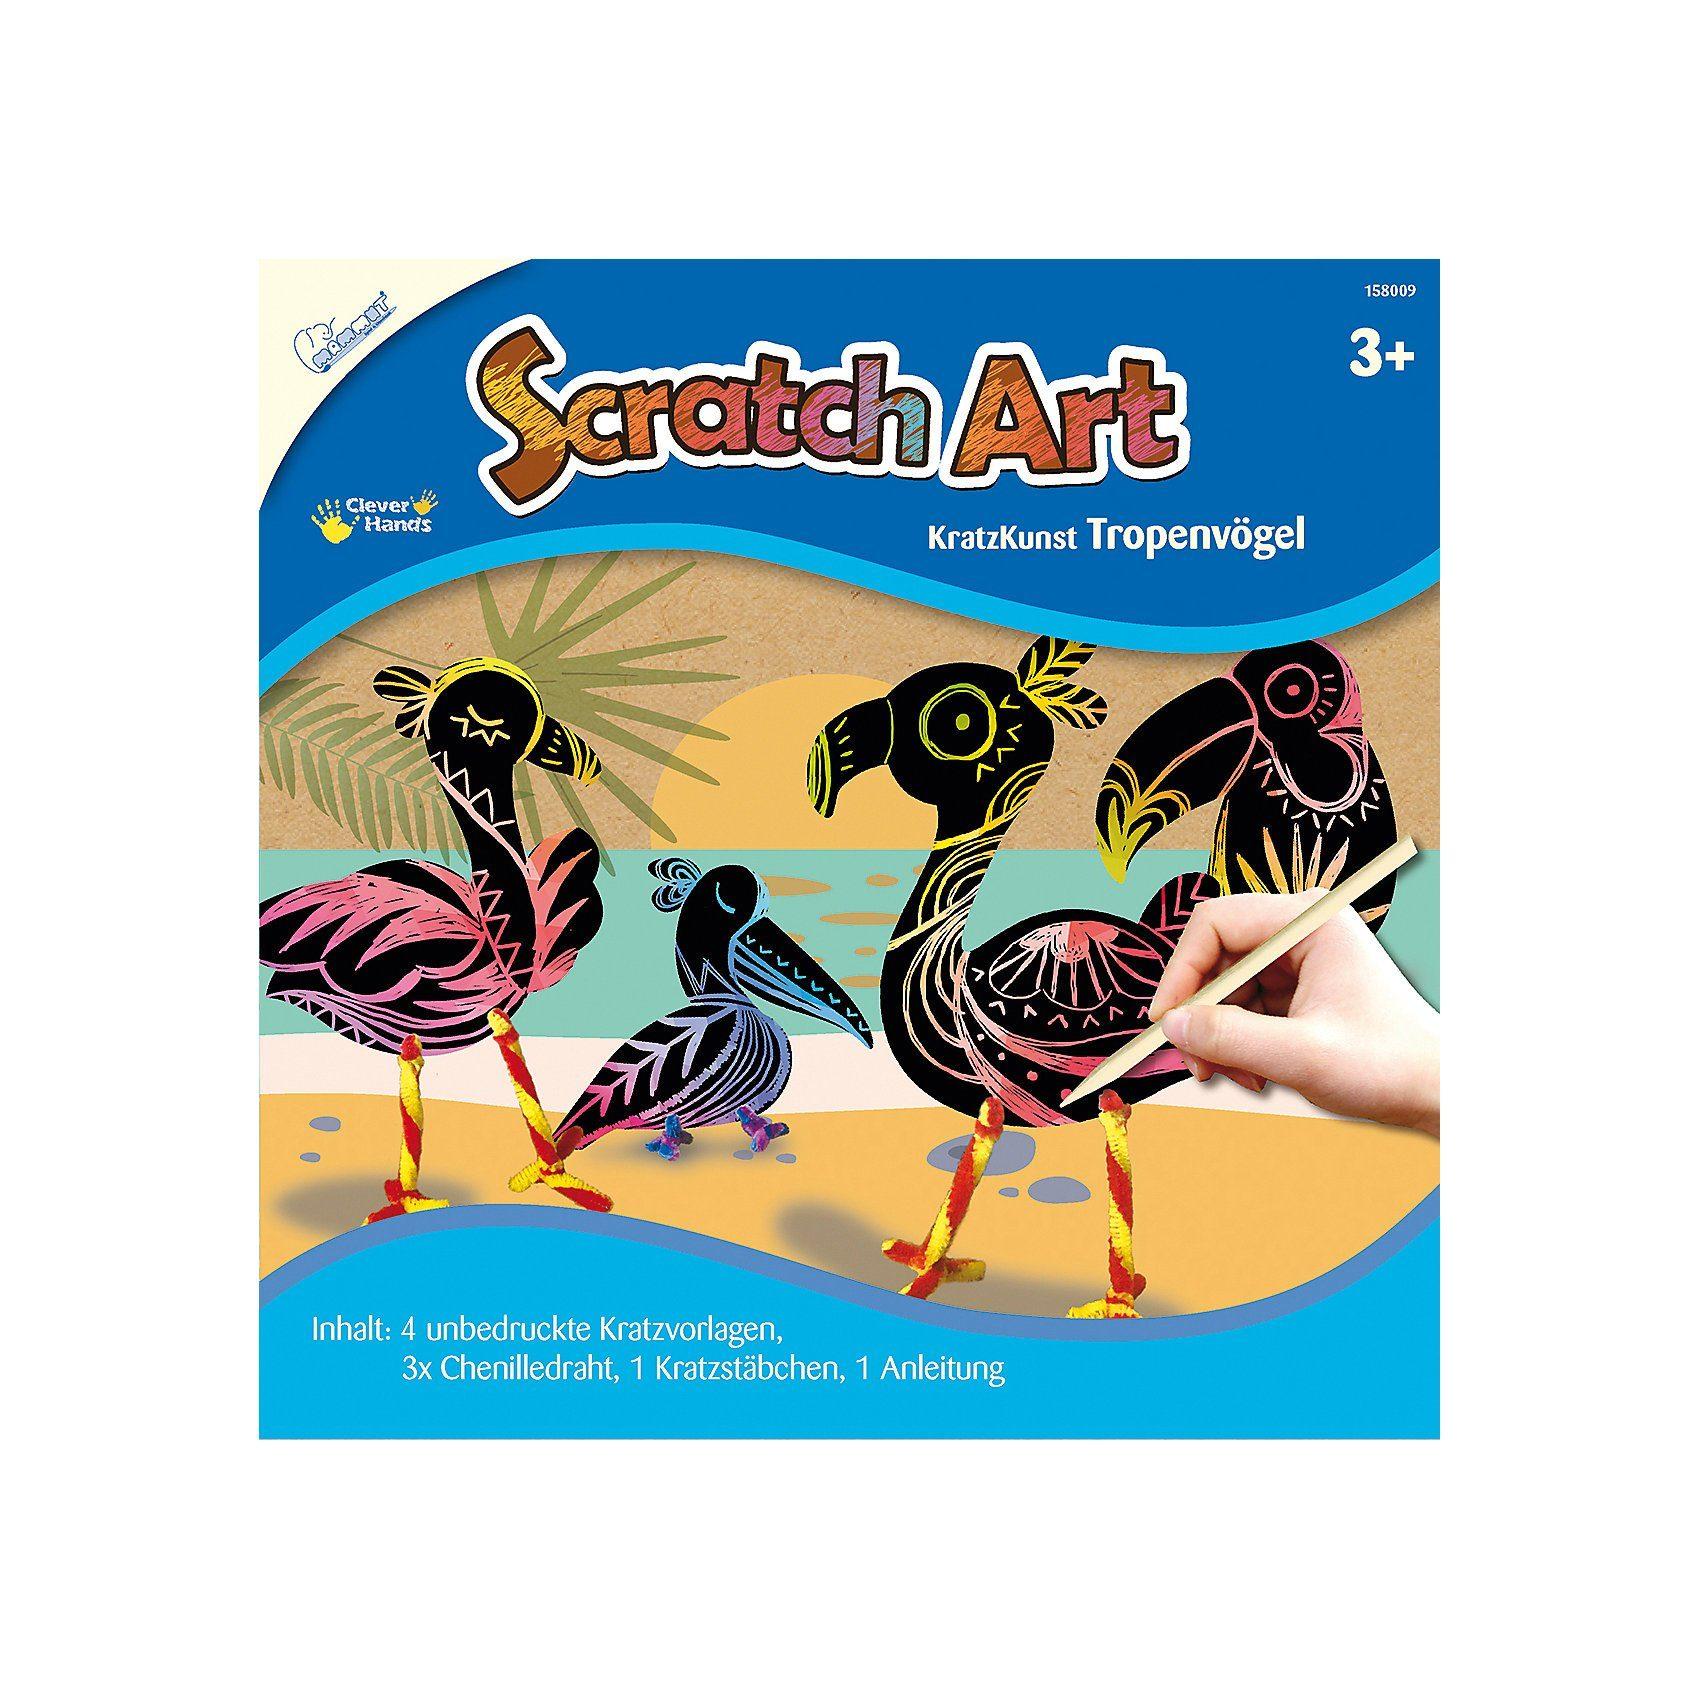 MAMMUT Spiel und Geschenk Scratch Art Tropenvögel